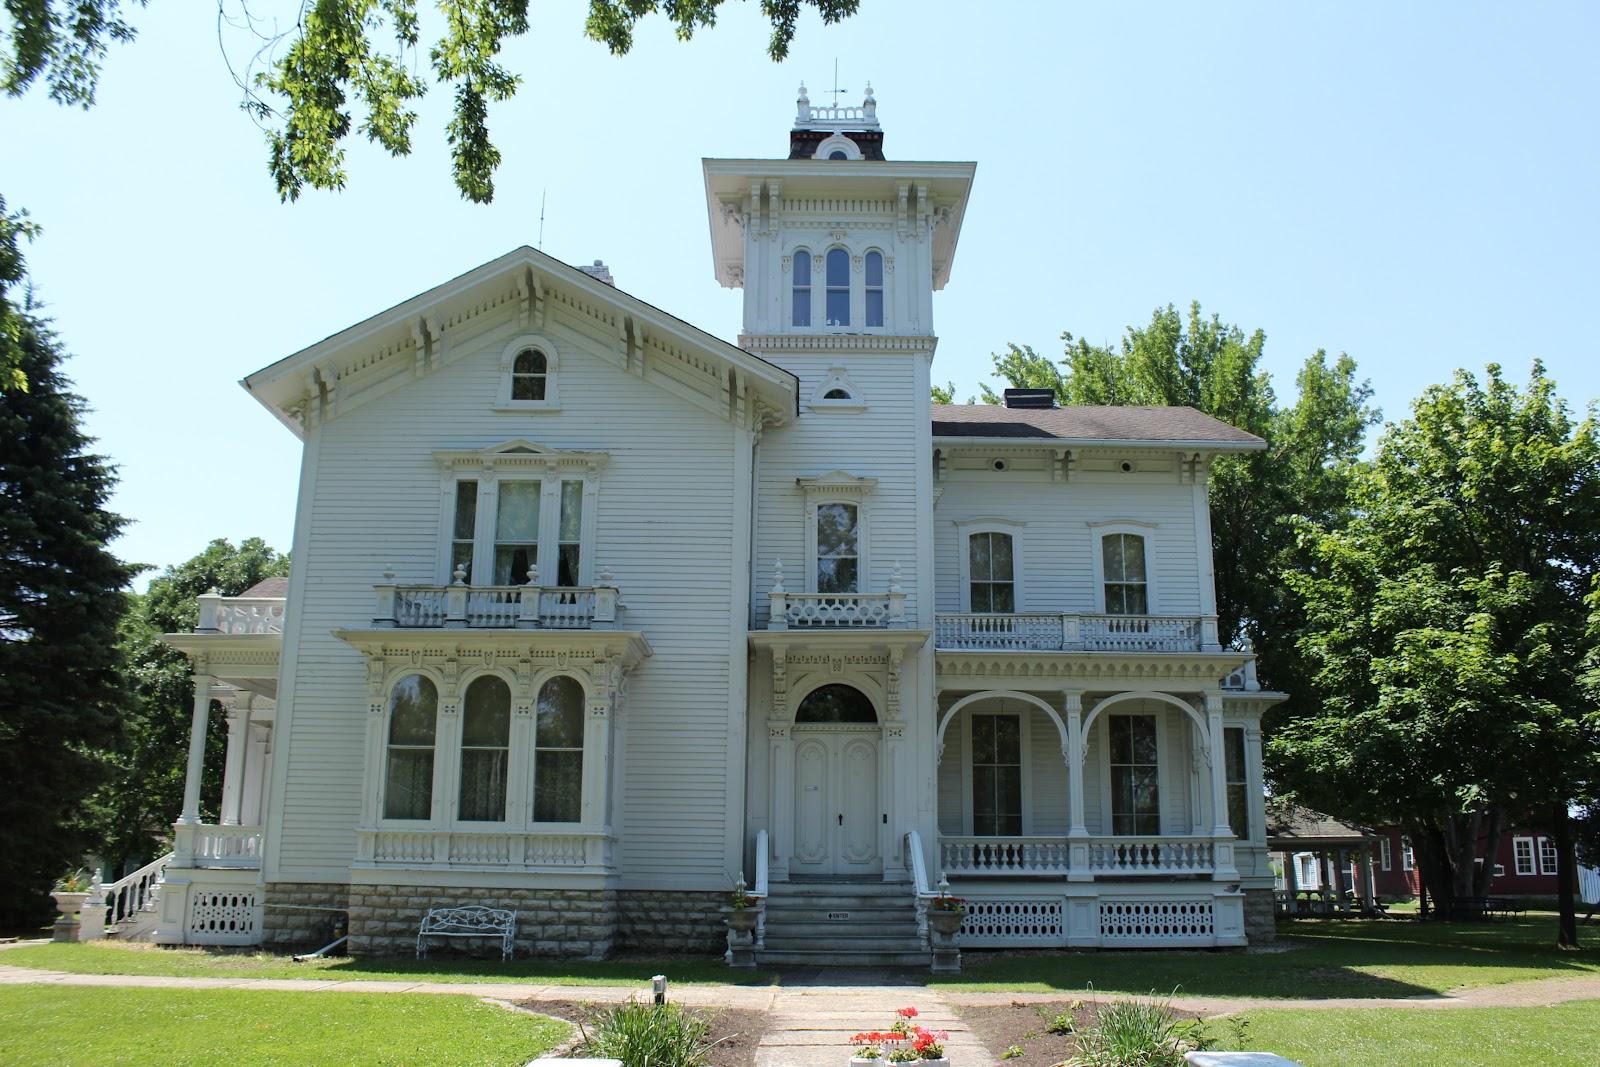 galloway house 2 - Fond du Lac County Historical Society